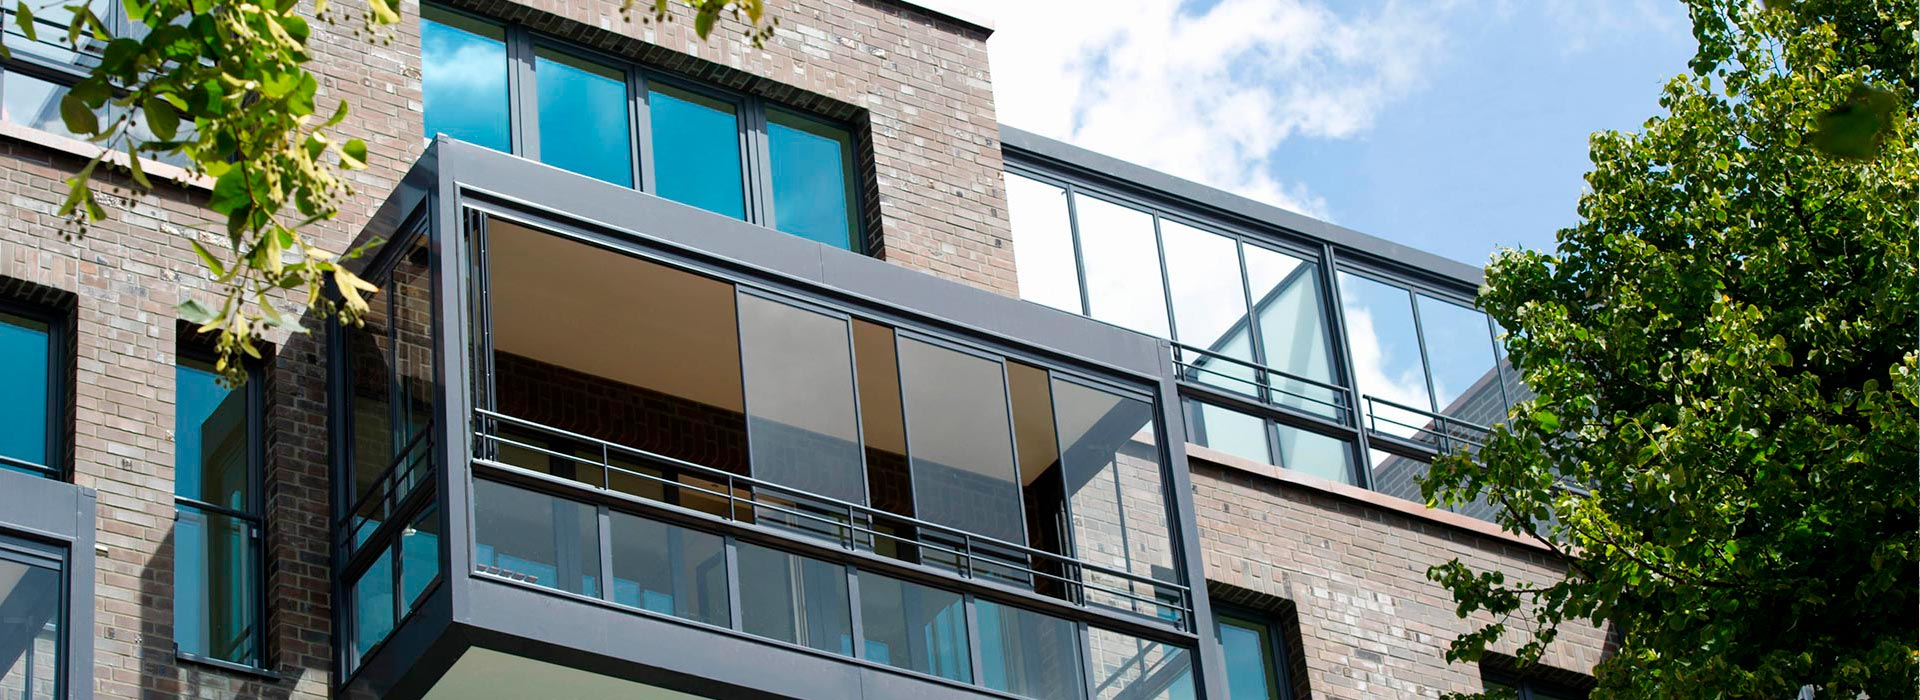 balkon balkongel nder balkonverglasung glashaus rehm wintergarten glashaus light. Black Bedroom Furniture Sets. Home Design Ideas